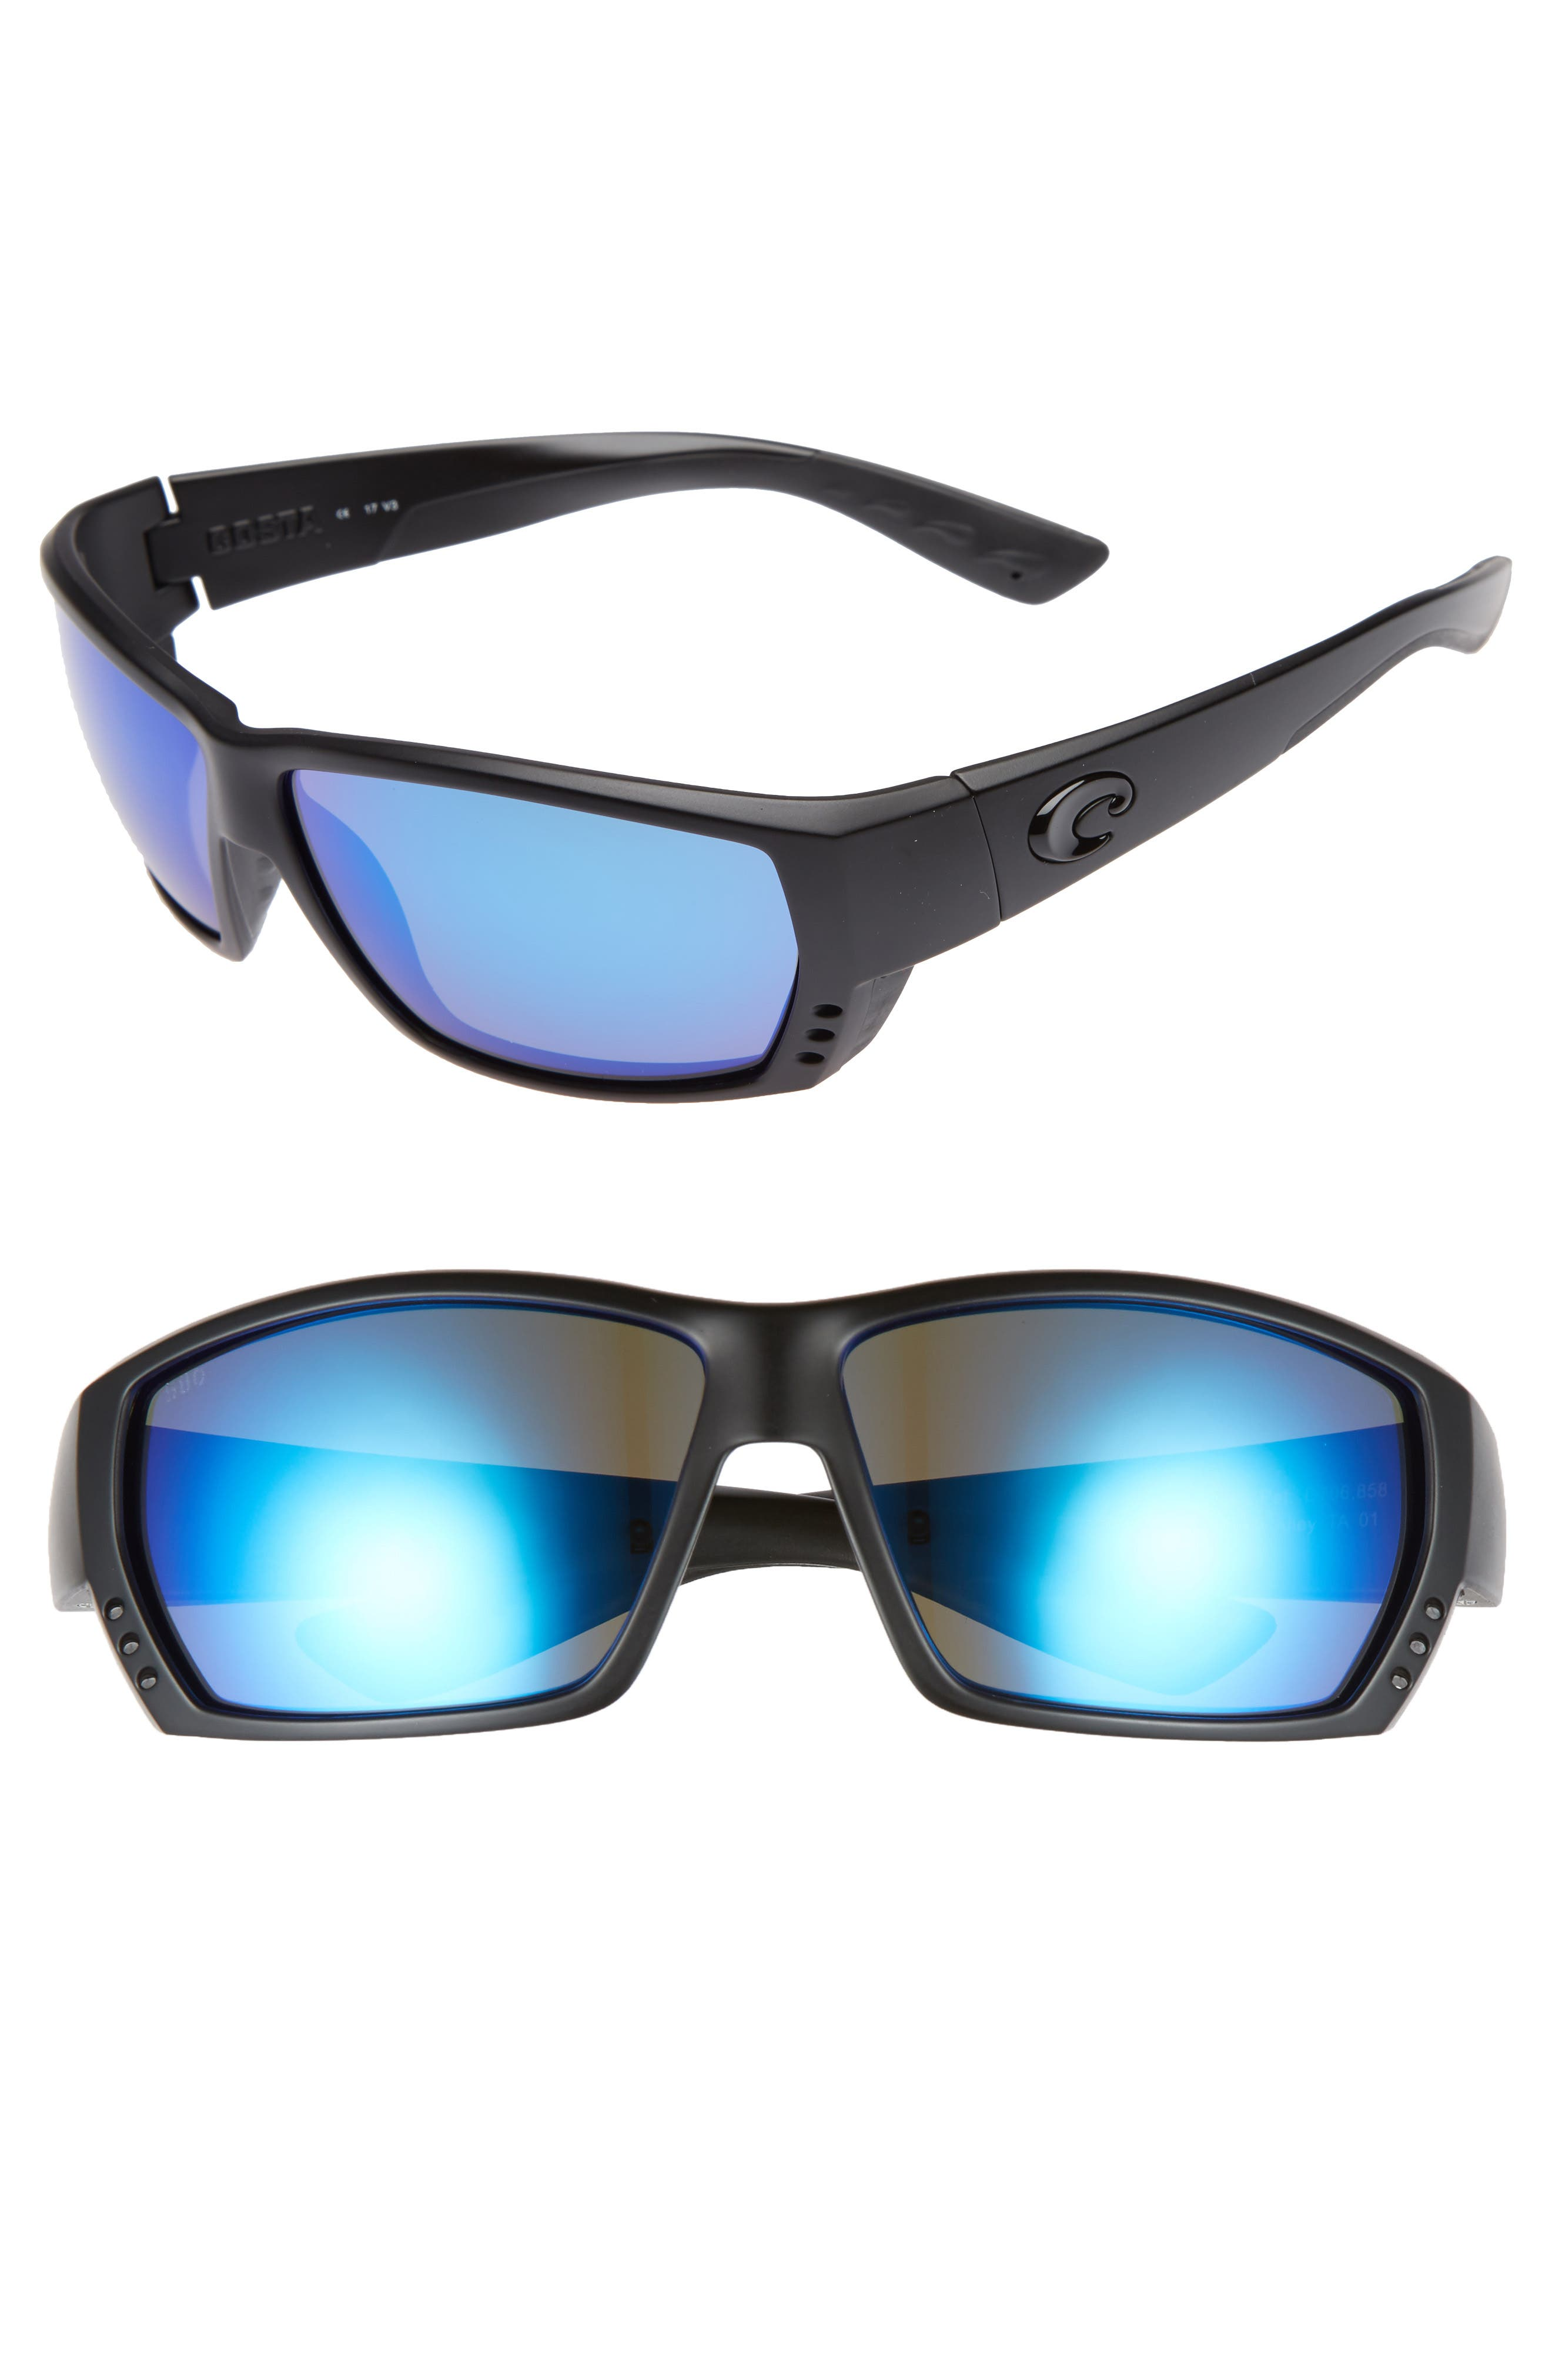 Tuna Alley 60mm Polarized Sunglasses,                             Main thumbnail 1, color,                             Blackout/ Blue Mirror